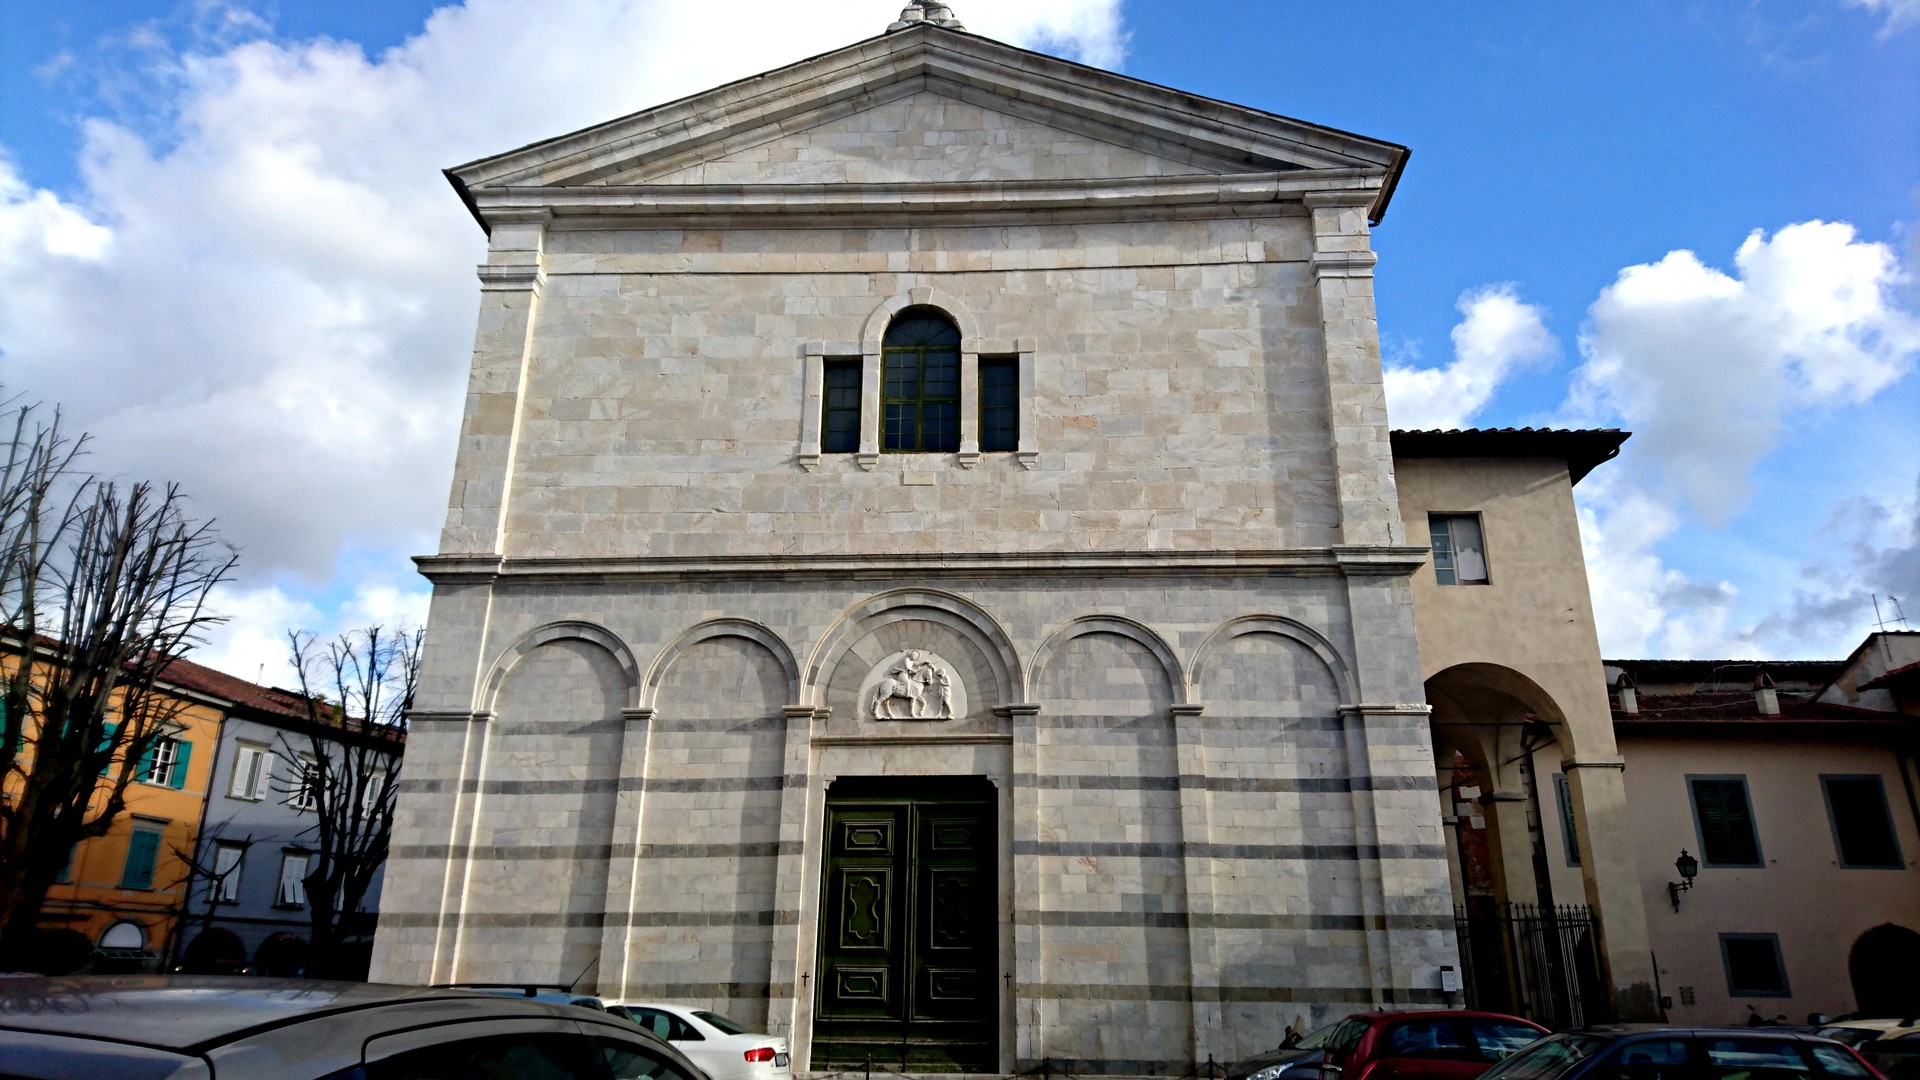 churches-and-their-beauty-e66d256775f524